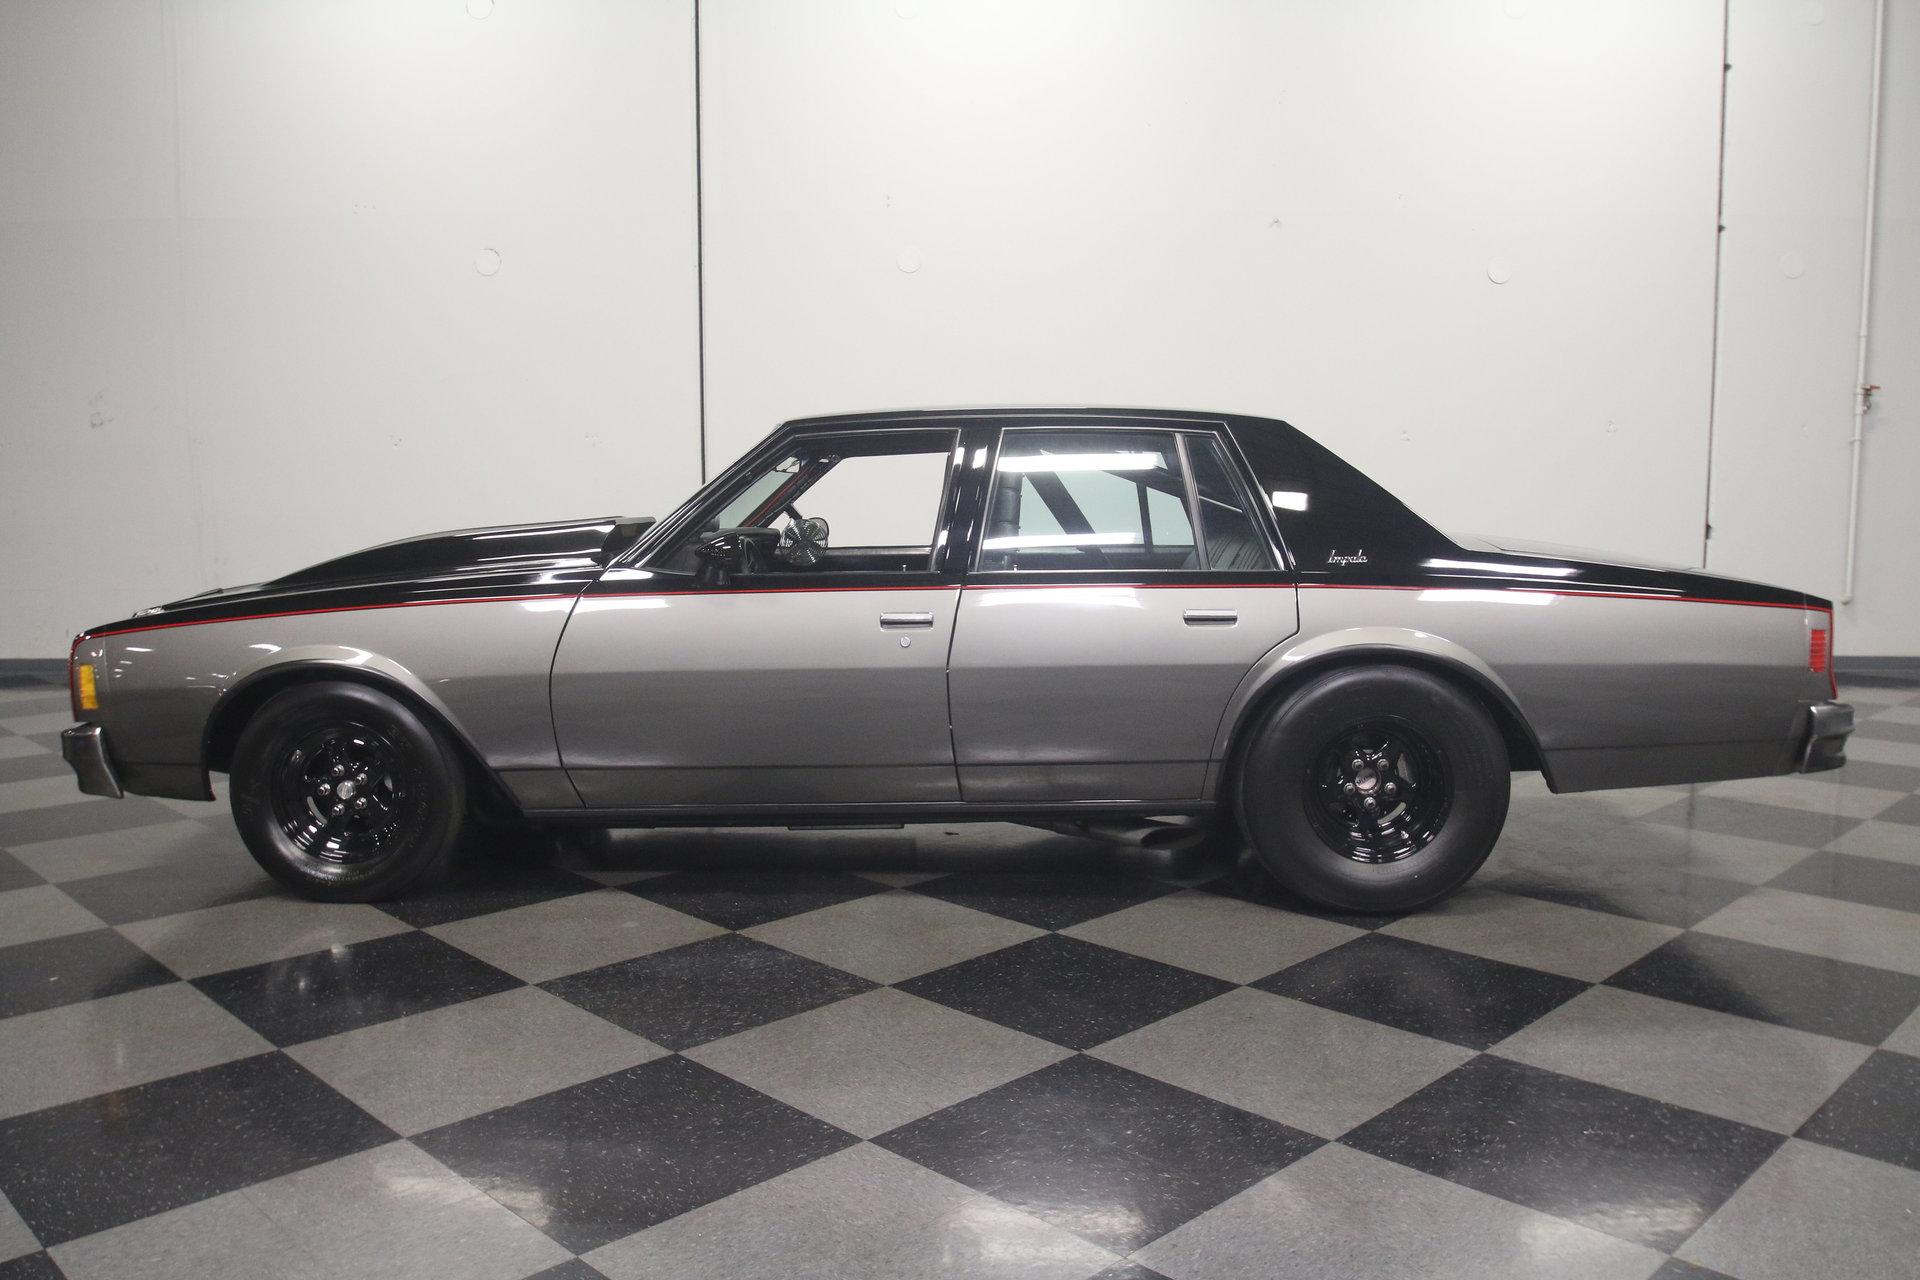 1979 Chevrolet Impala Drag Car for sale #78933   MCG